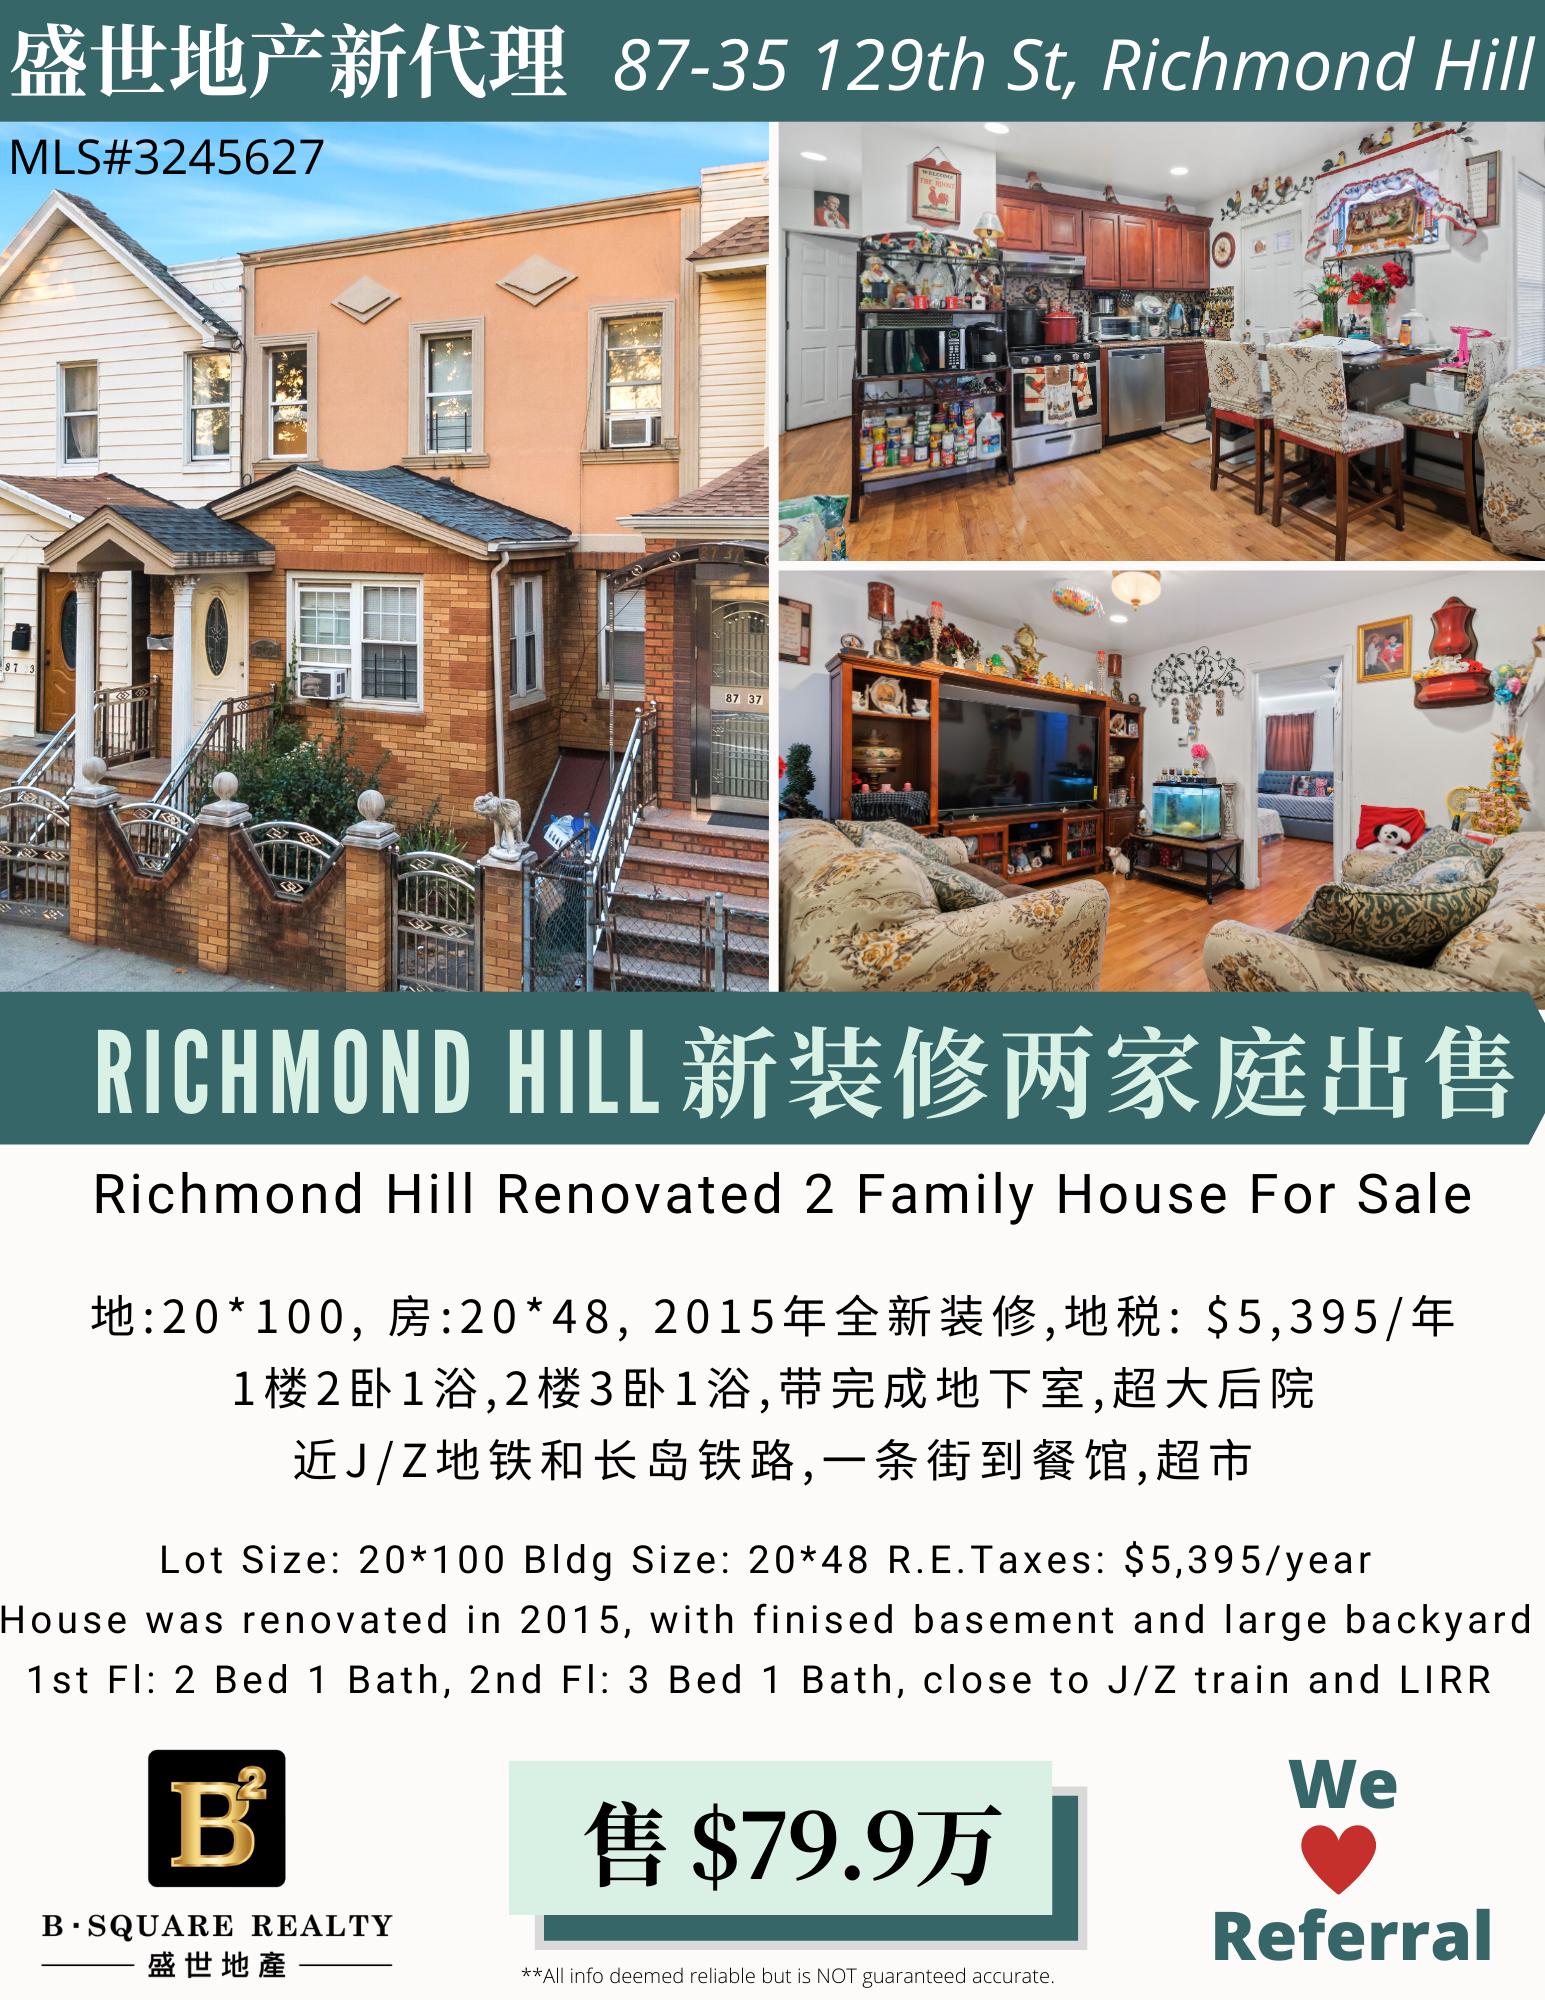 87-35 Richmond Hill.png